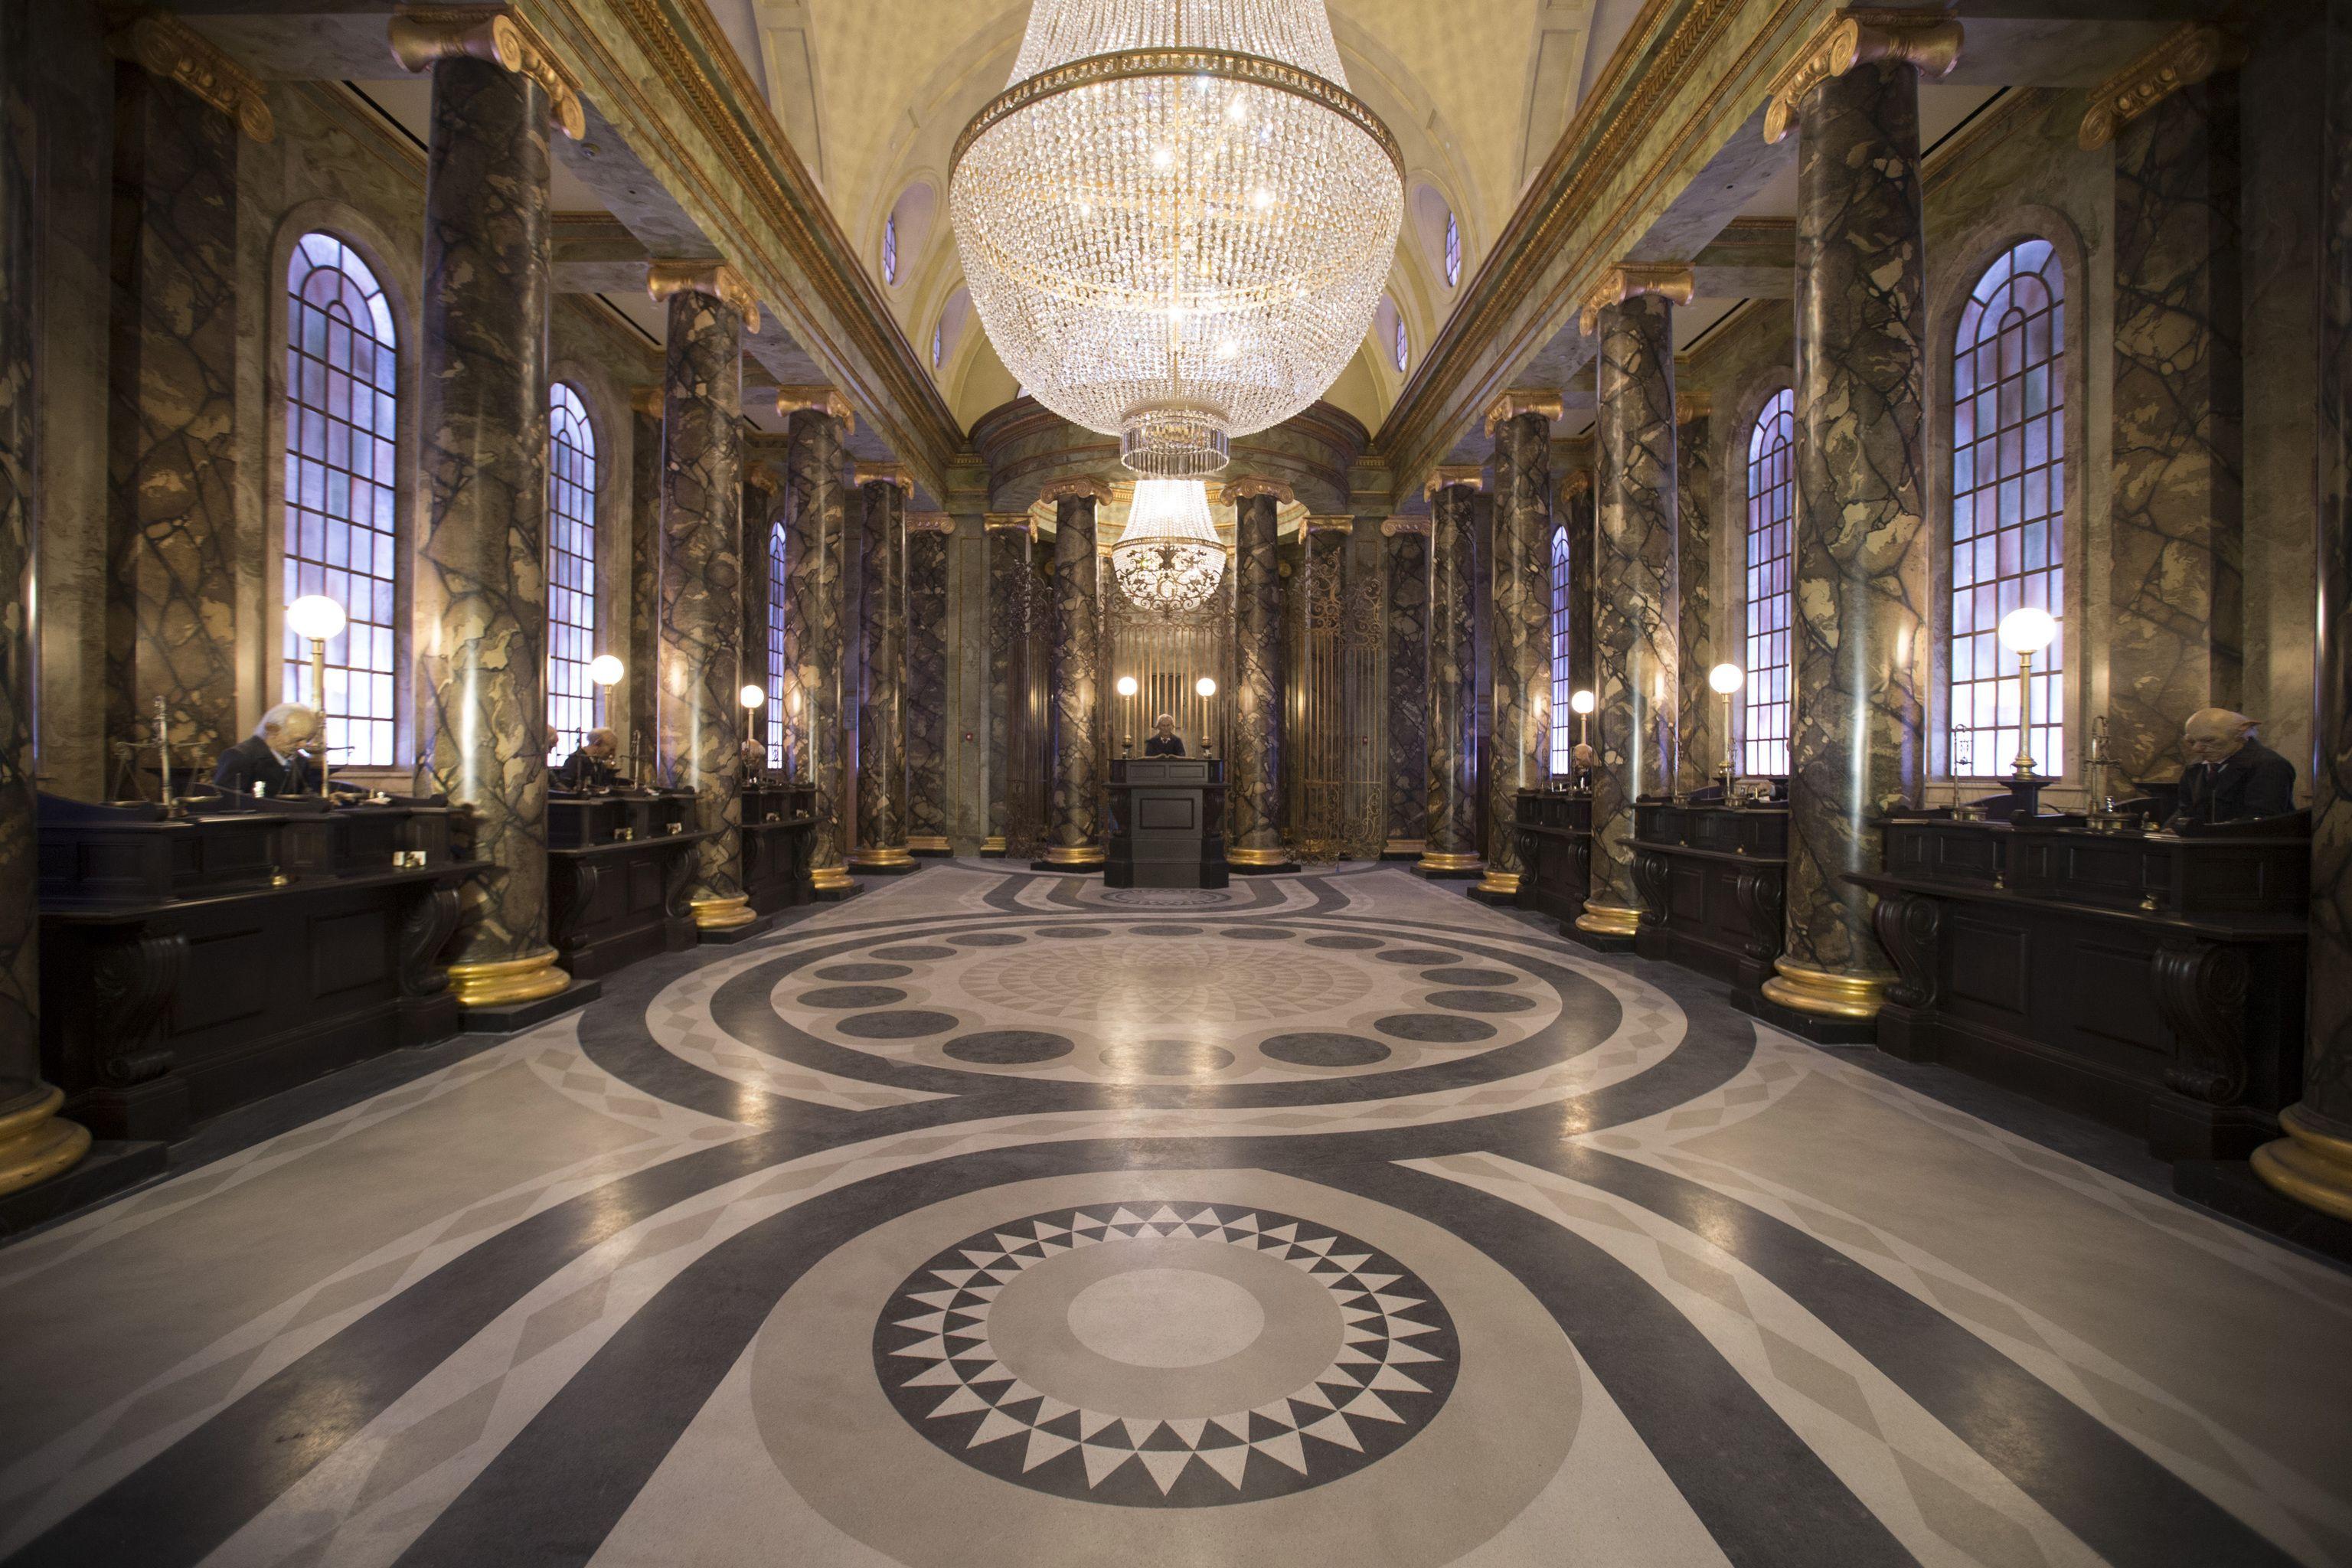 Bank Interior Universal Studios Florida Universal Harry Potter Orlando Harry Potter Theme Park